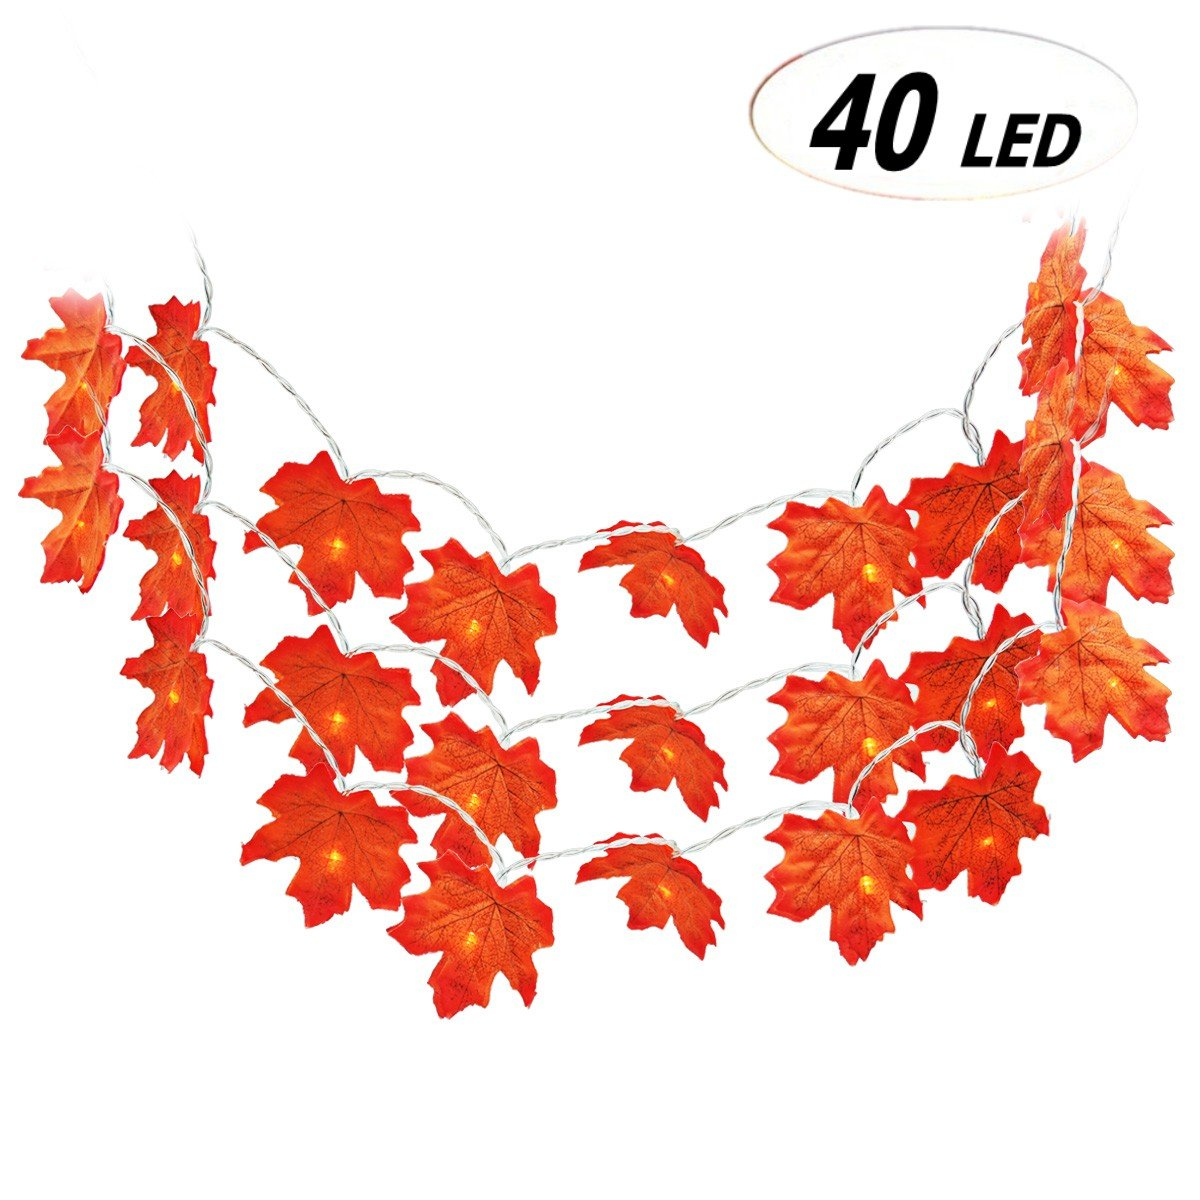 Fall Maple Leaf Decorations Light, Keepack Autumn Garland 4M 40 Lights Battery Powered Fall Garland Maple Leaf Lights